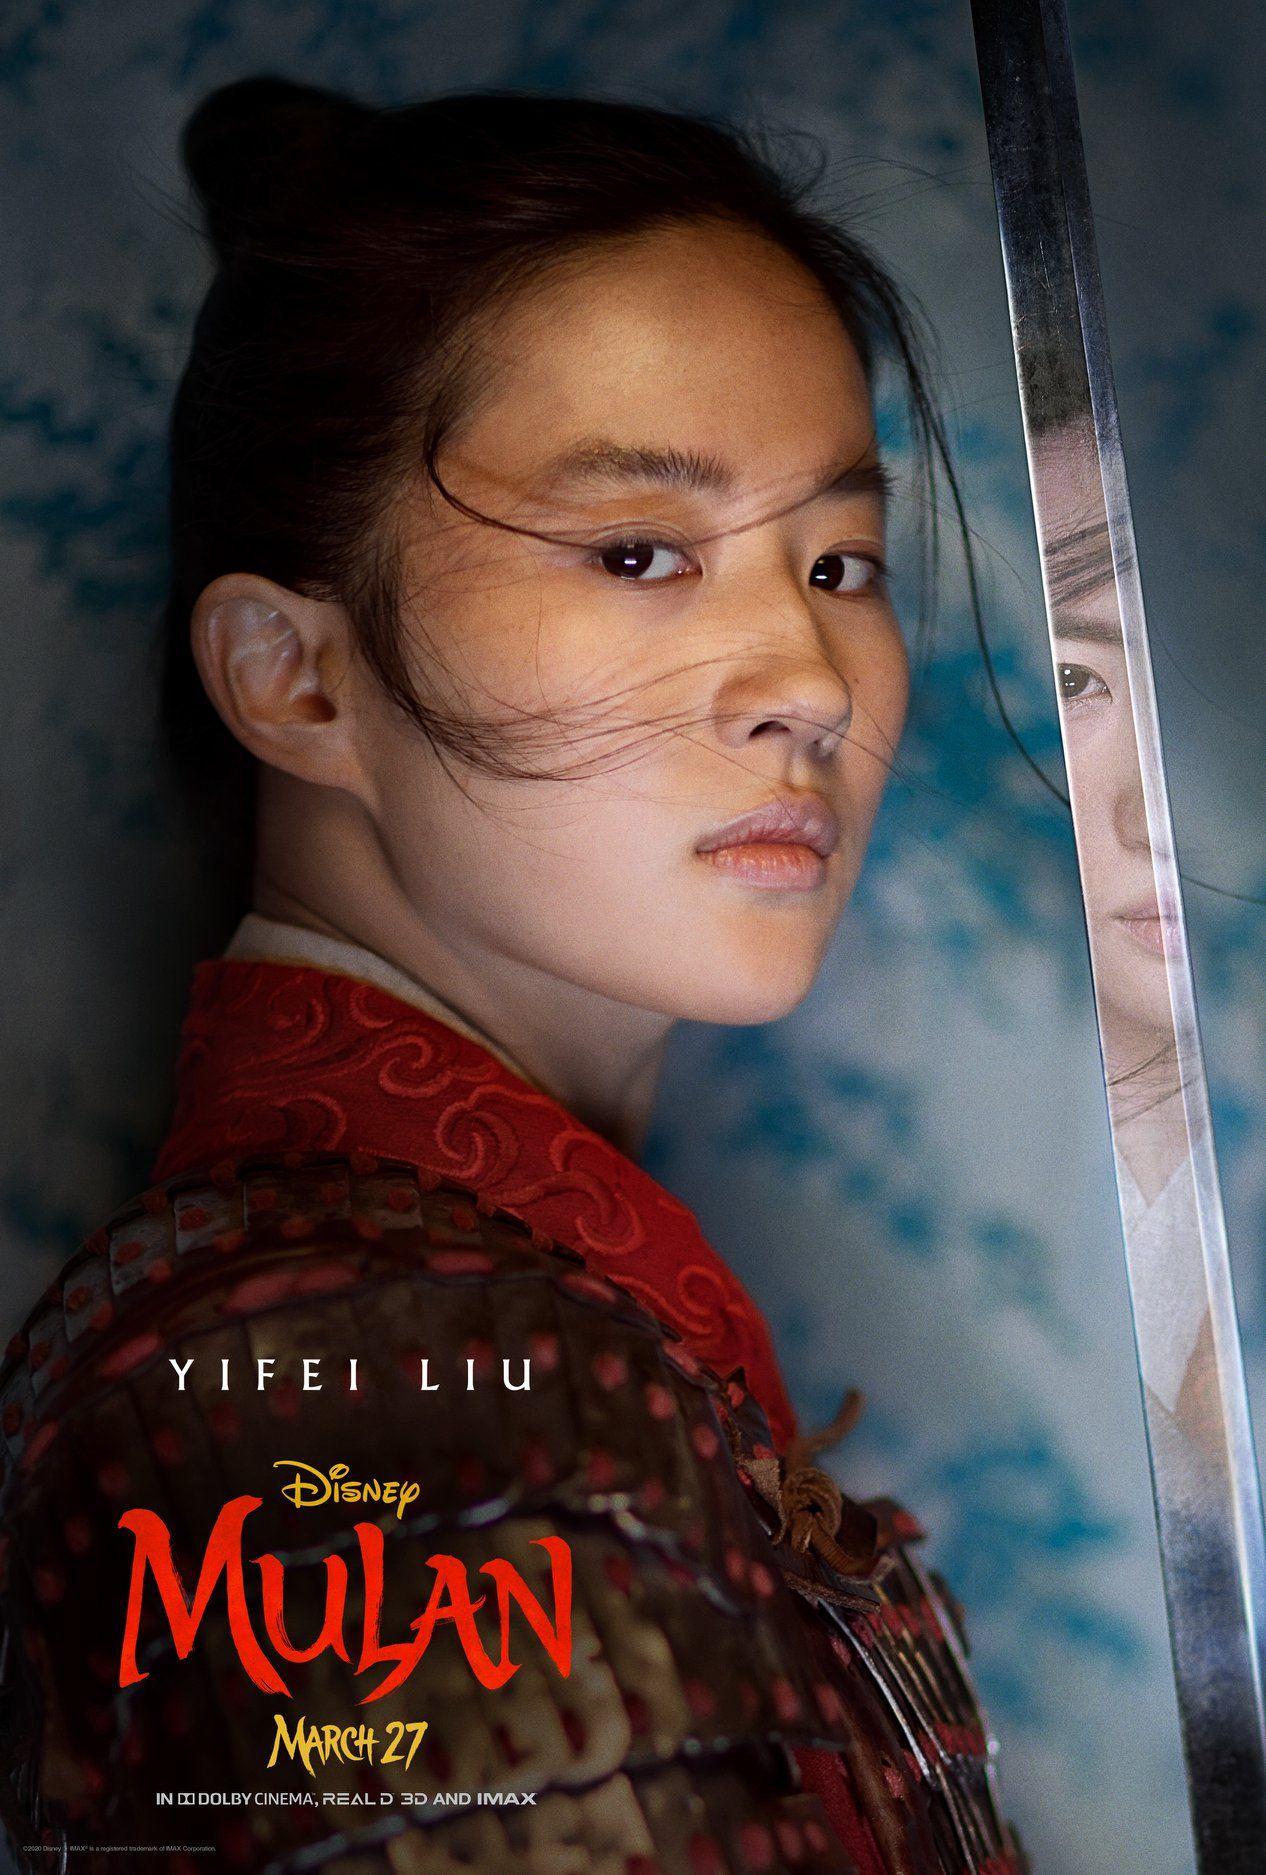 Mulan 2020 Film Gallery Disney Wiki Fandom In 2020 Mulan Movie Hua Mulan Movies Online